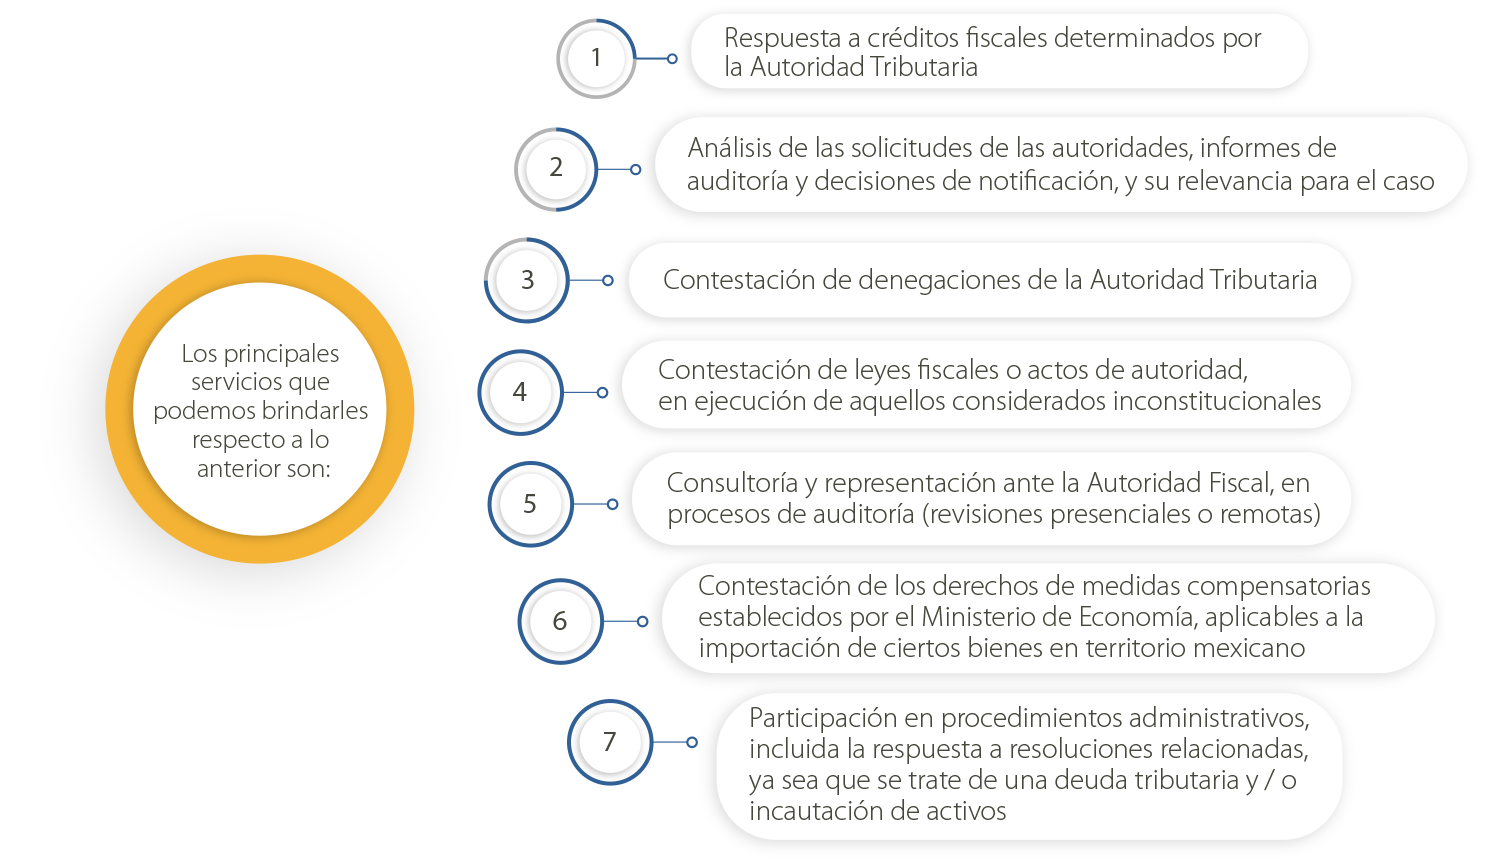 https://businesstaxconsulting.com.mx/es/wp-content/uploads/2020/07/D5.png